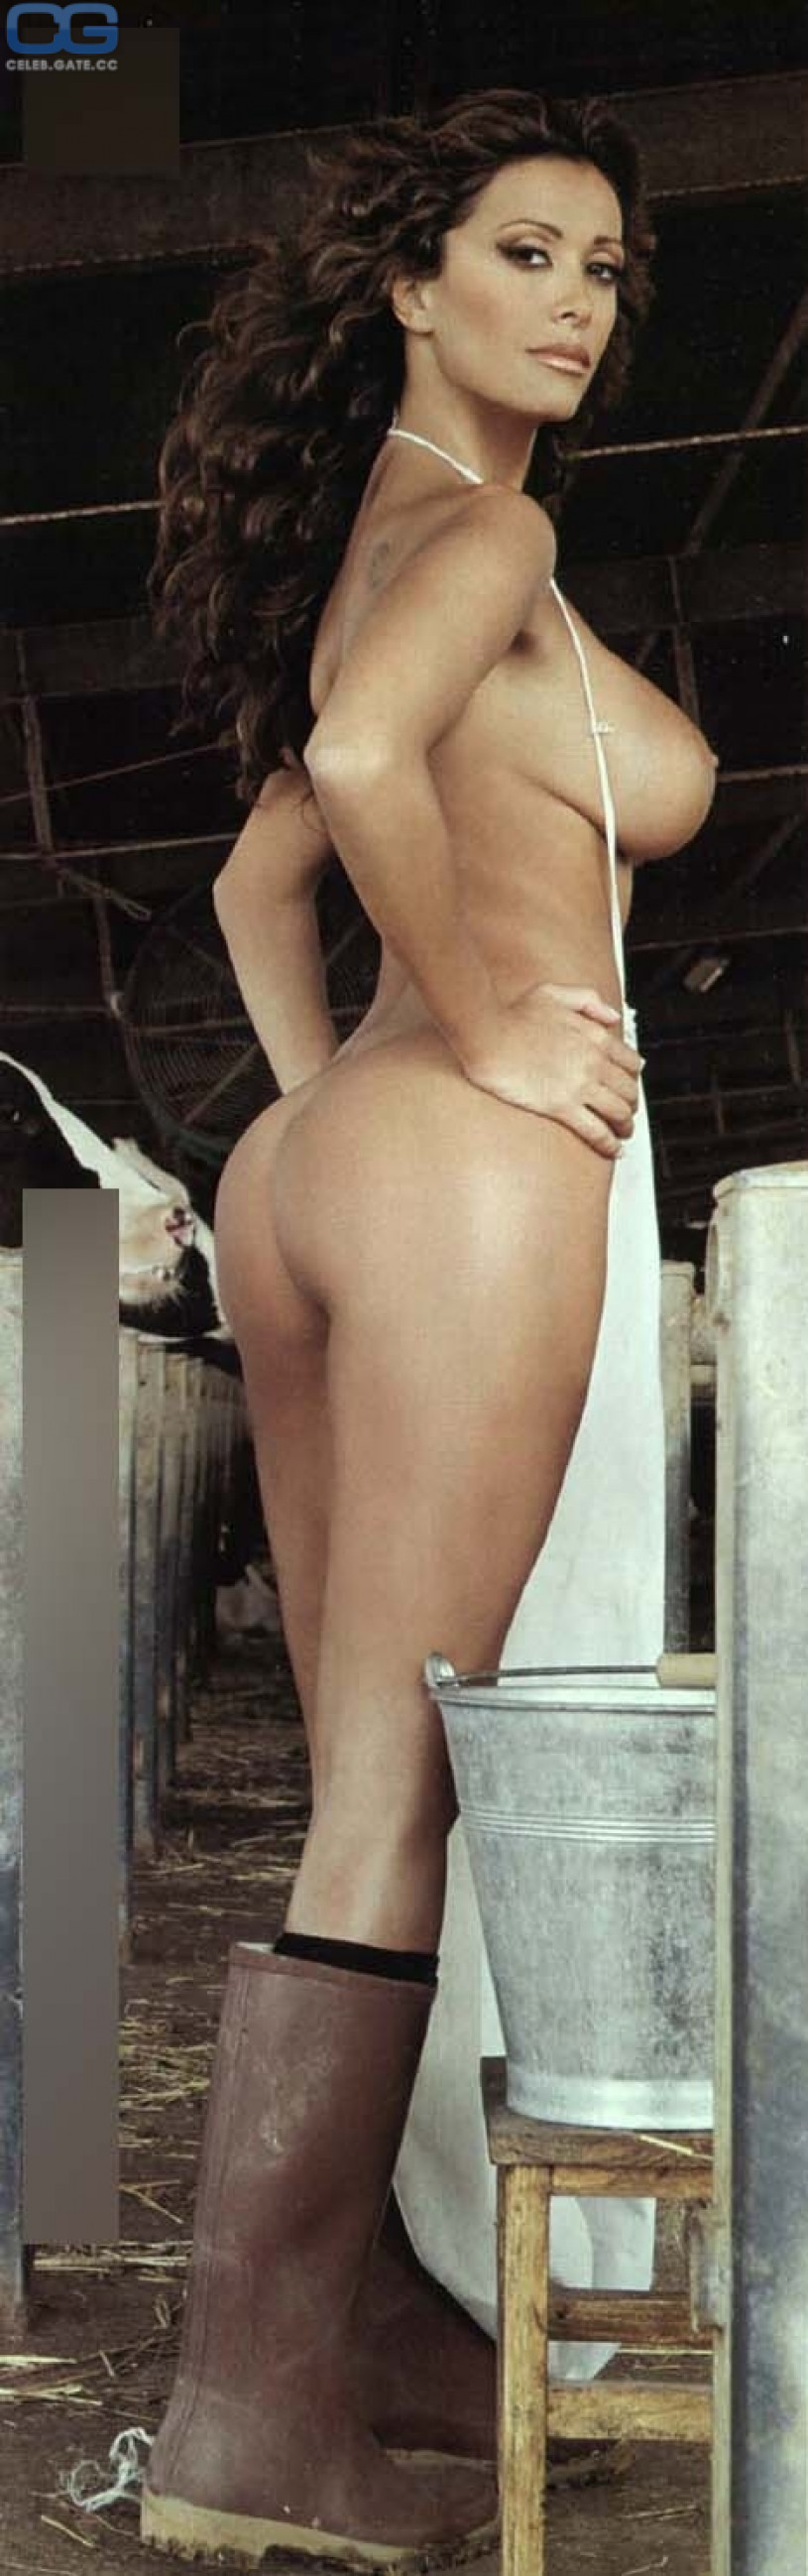 buck naked on a big wheel